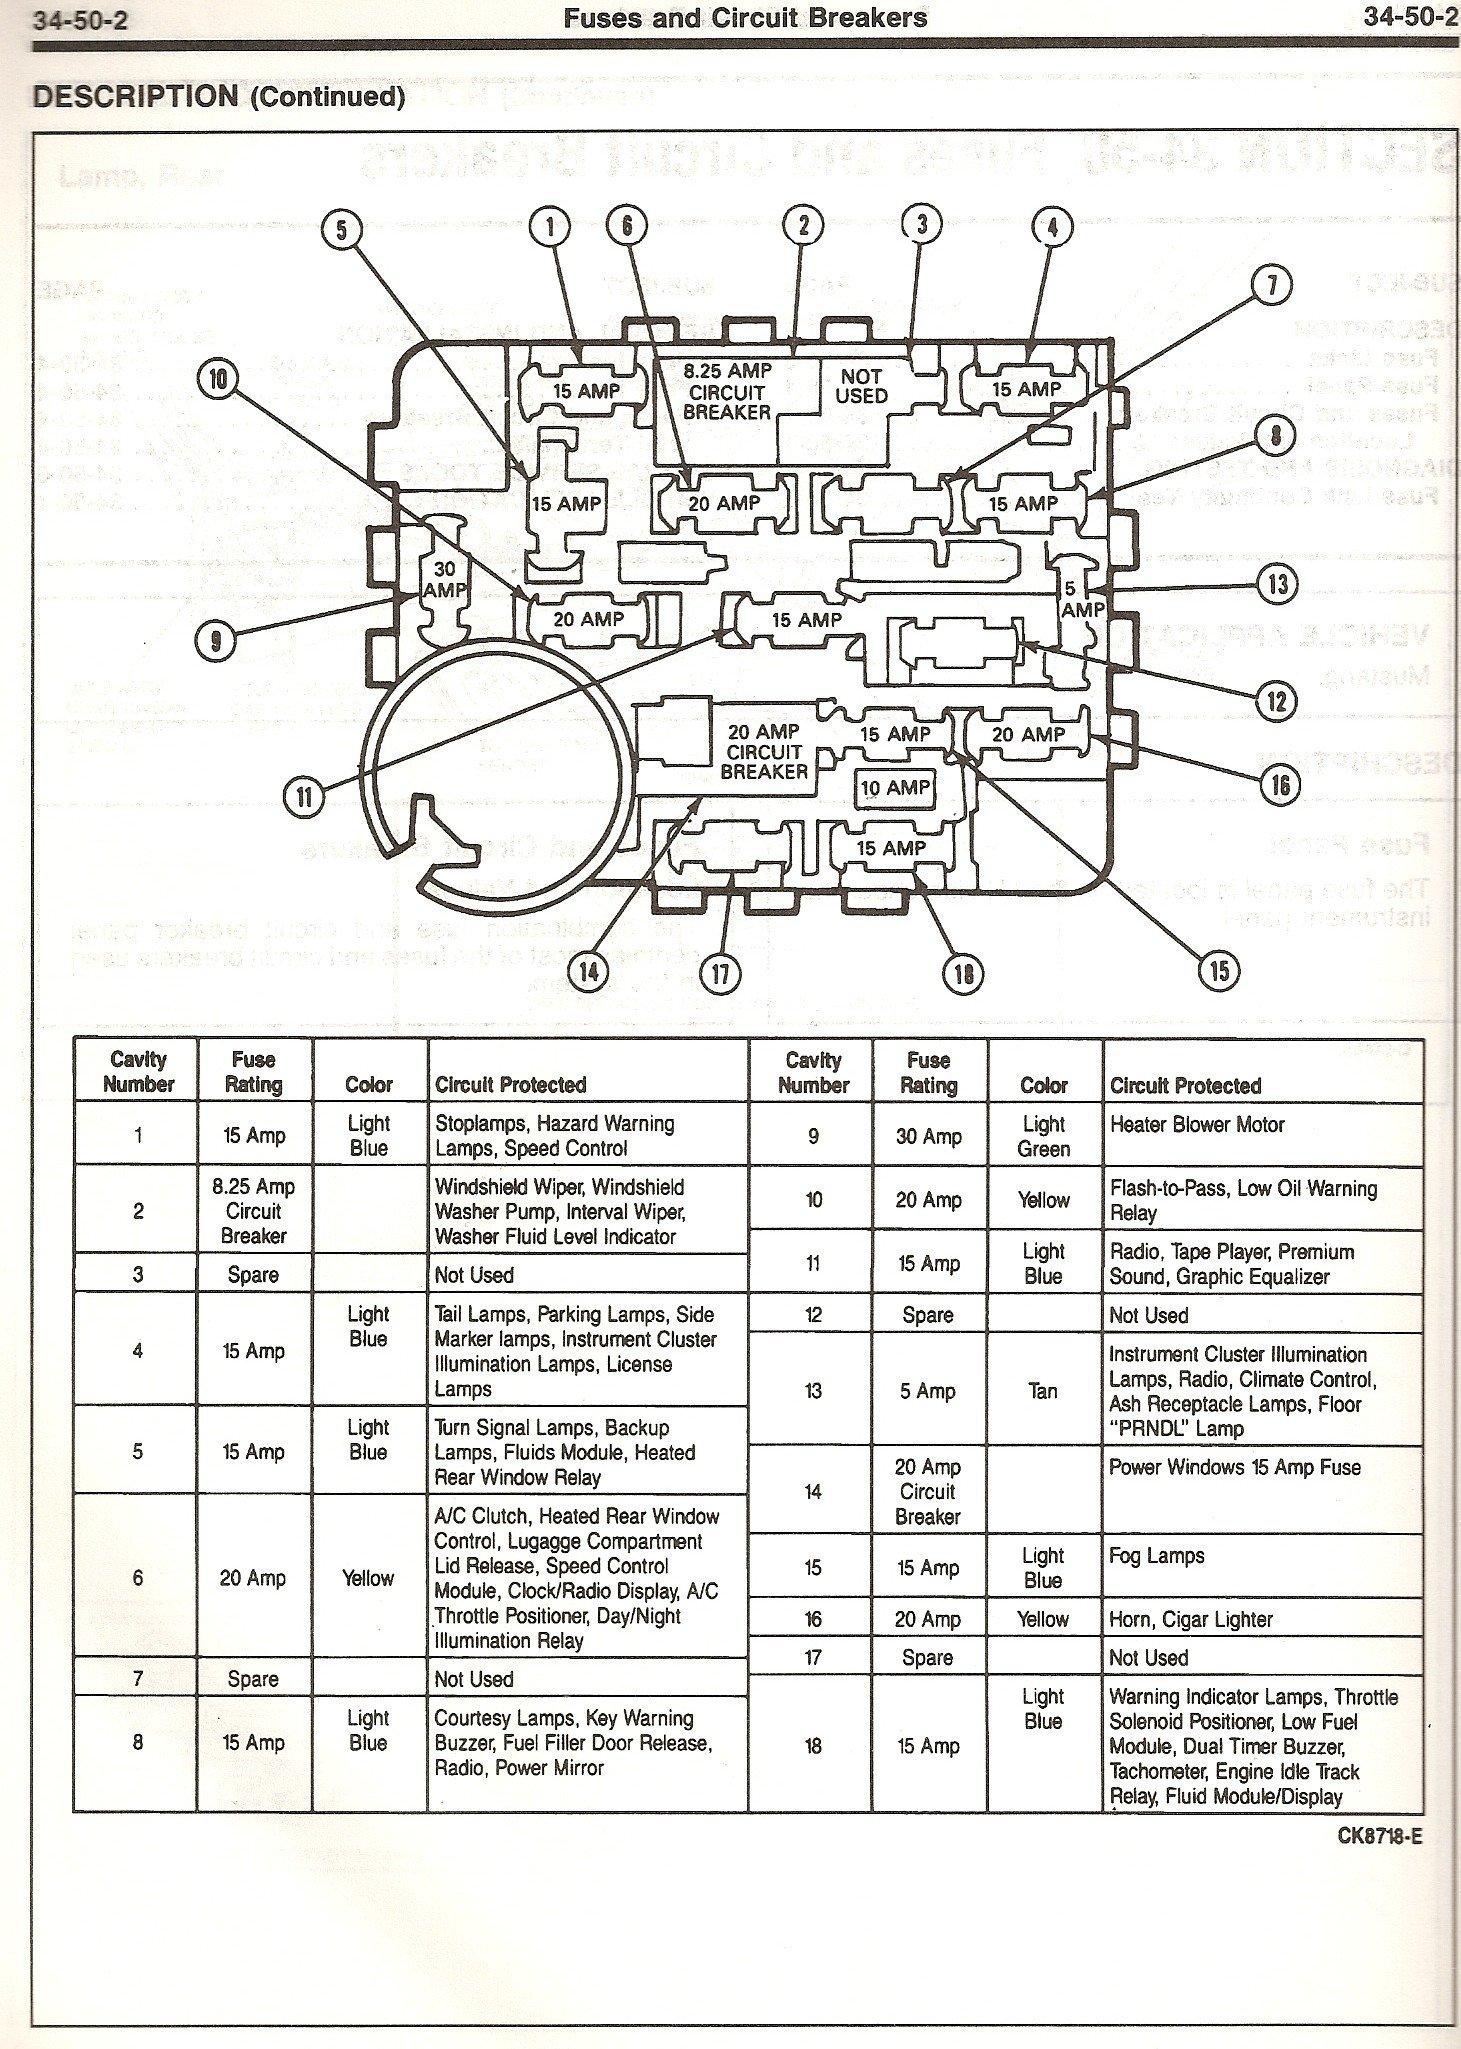 2015 ford mustang fuse box diagram 88 mustang fuse box wiring diagram data  88 mustang fuse box wiring diagram data